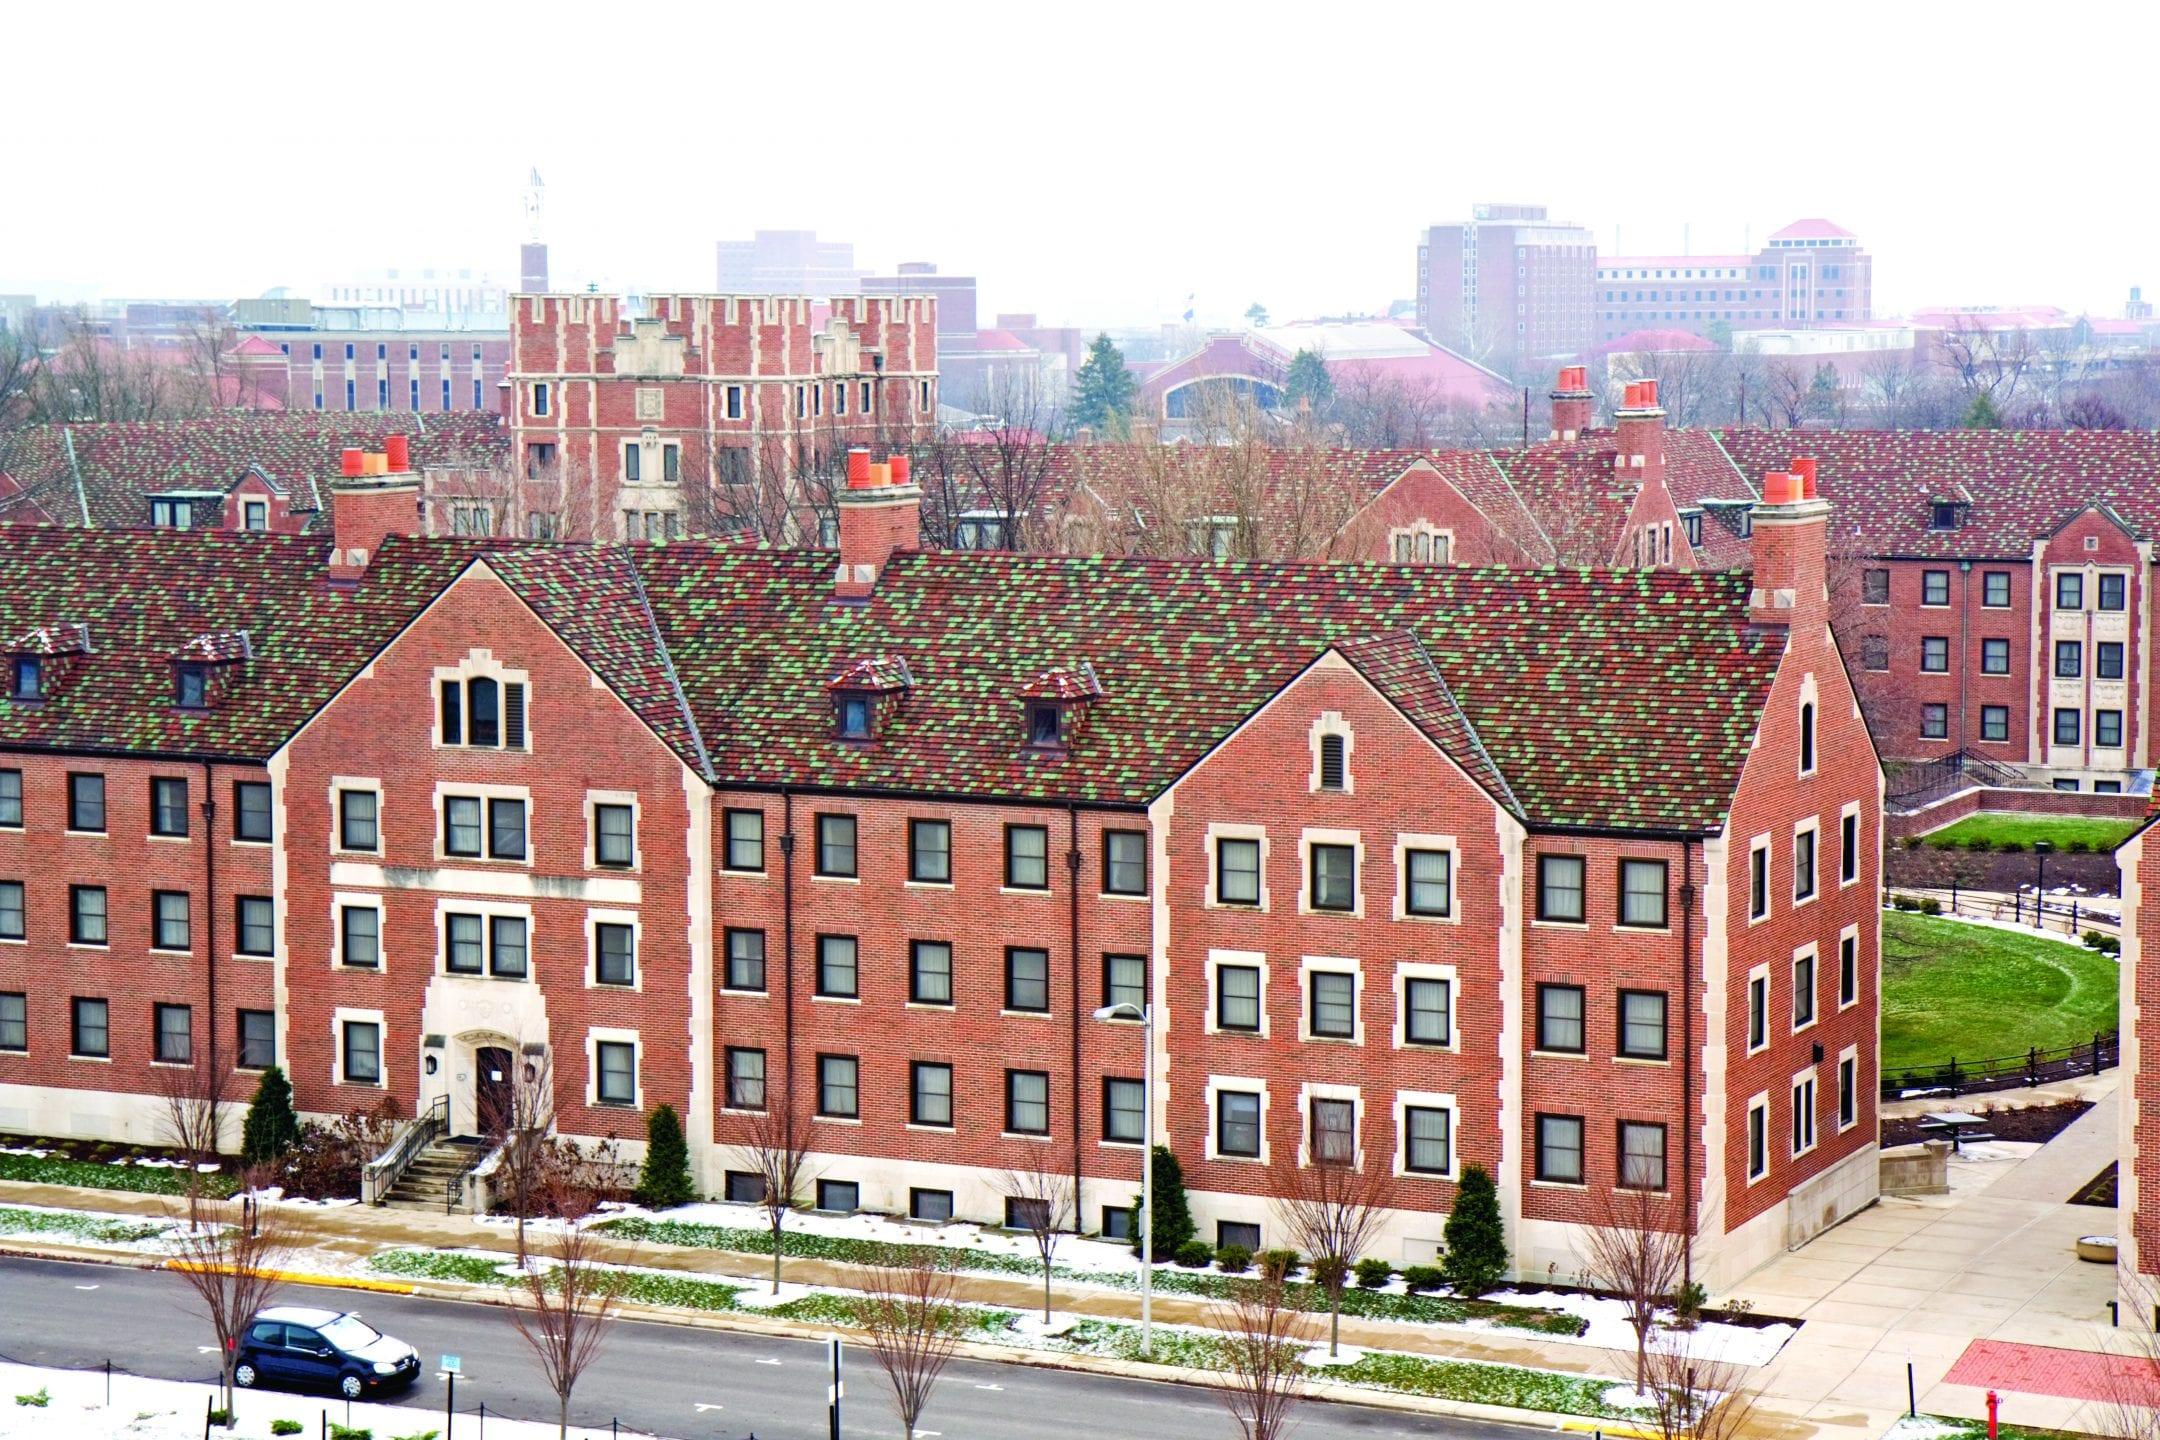 Purdue University Ludowici Roof Tile